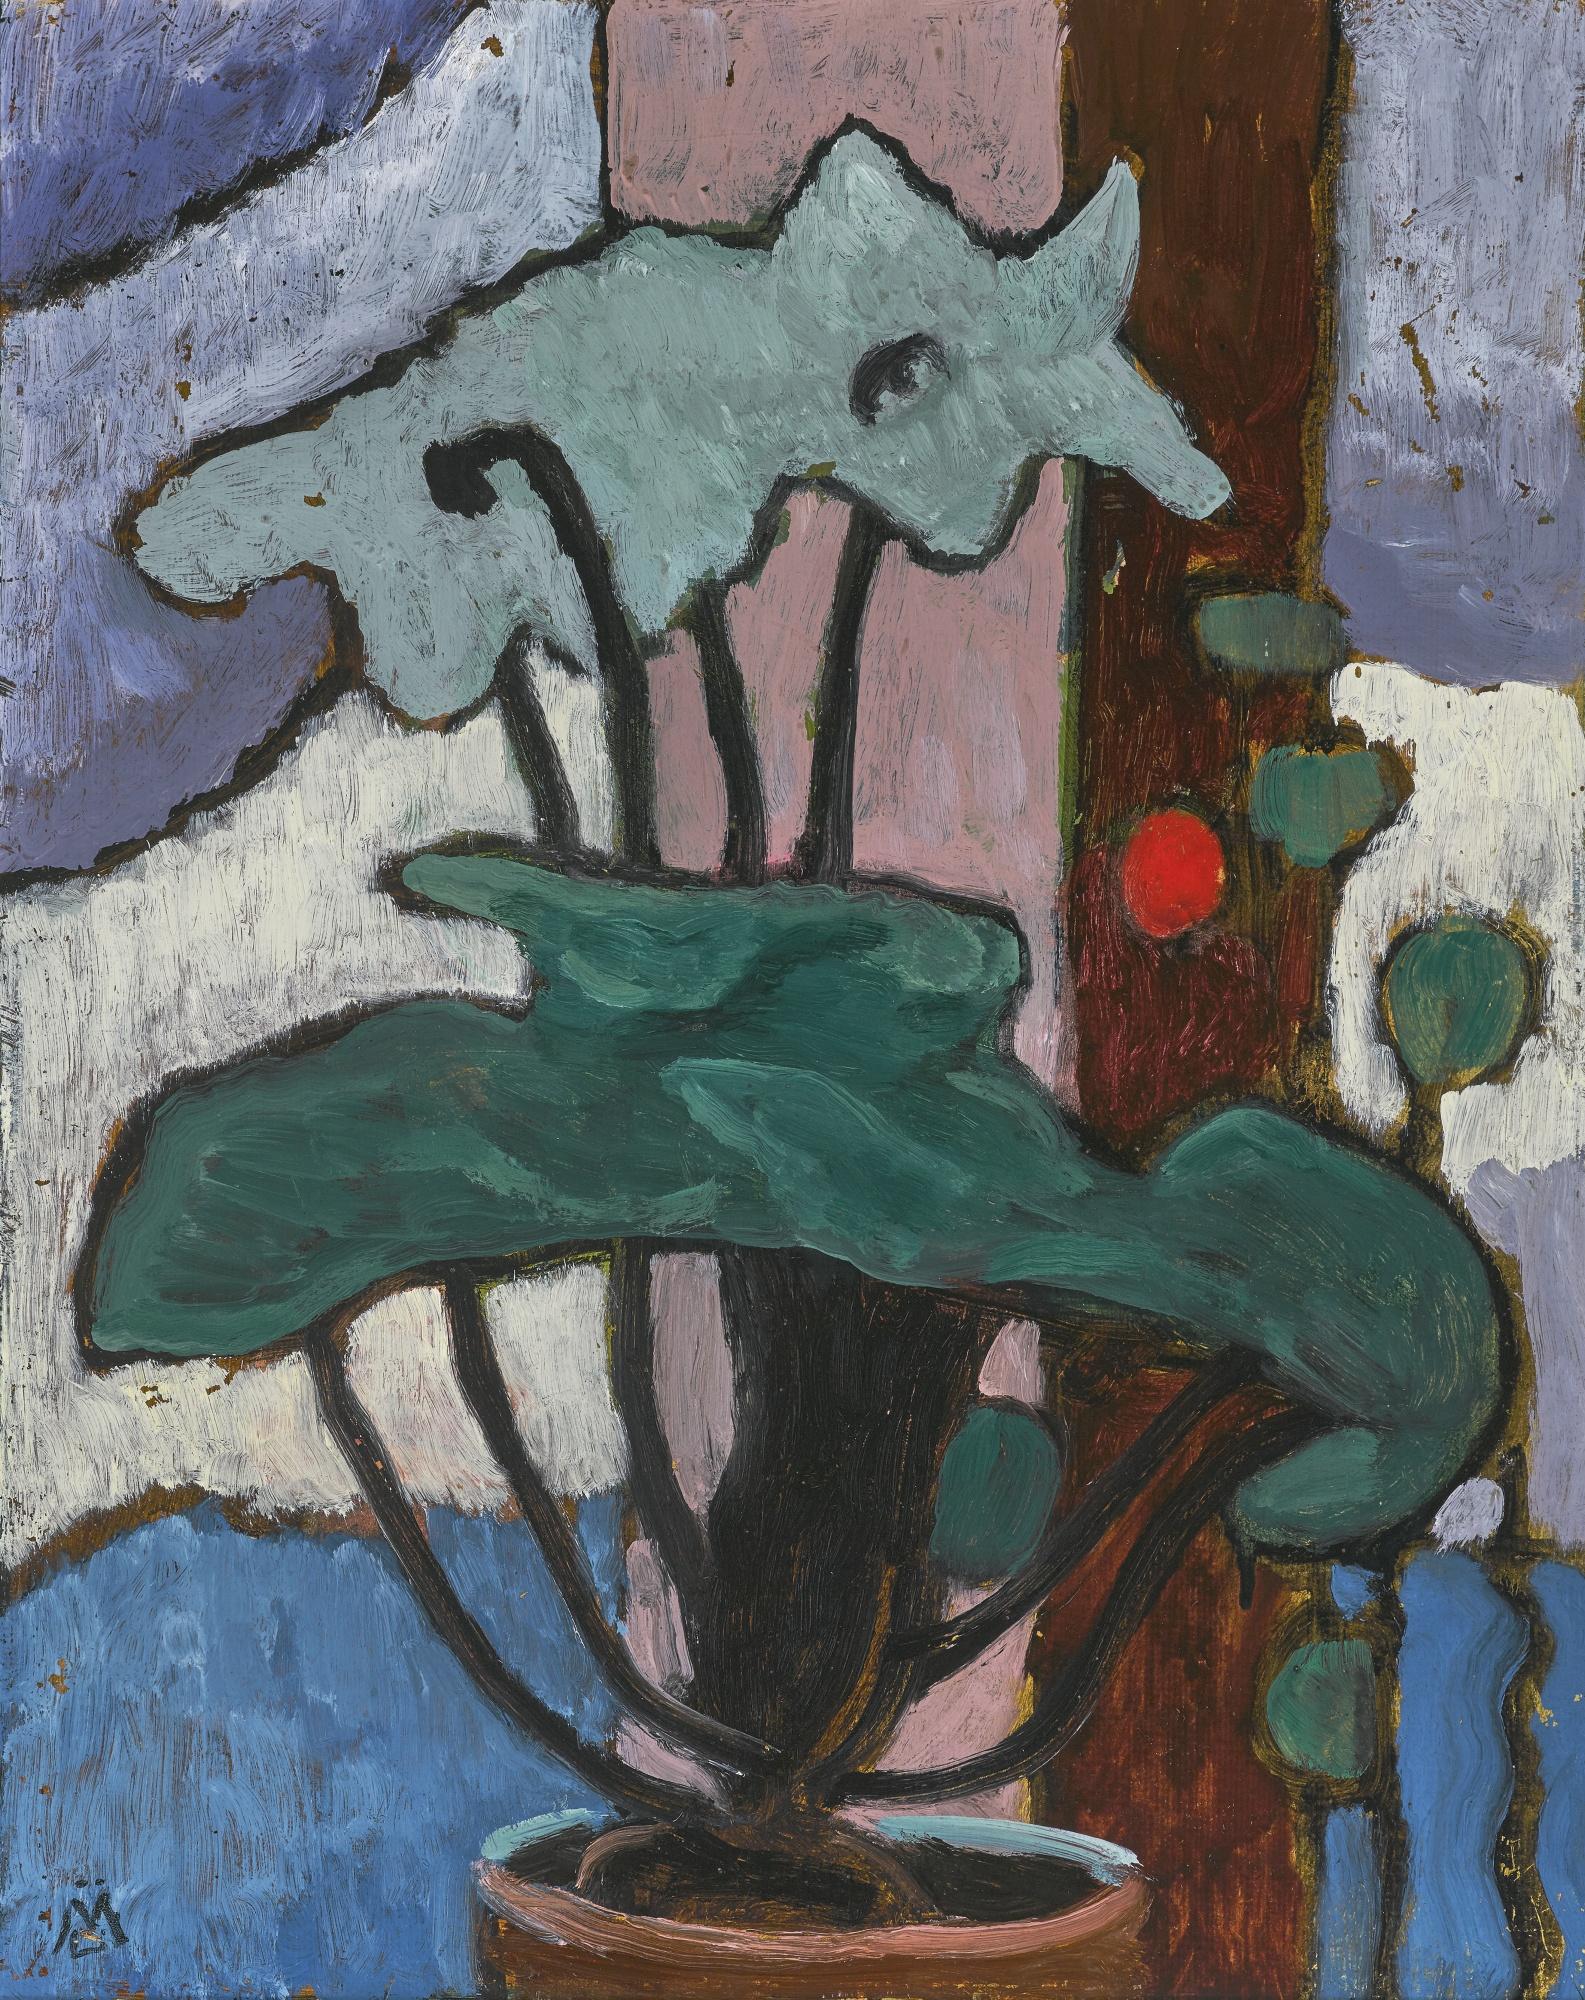 Gabriele Munter-Topfpflanze (Pot Plant)-